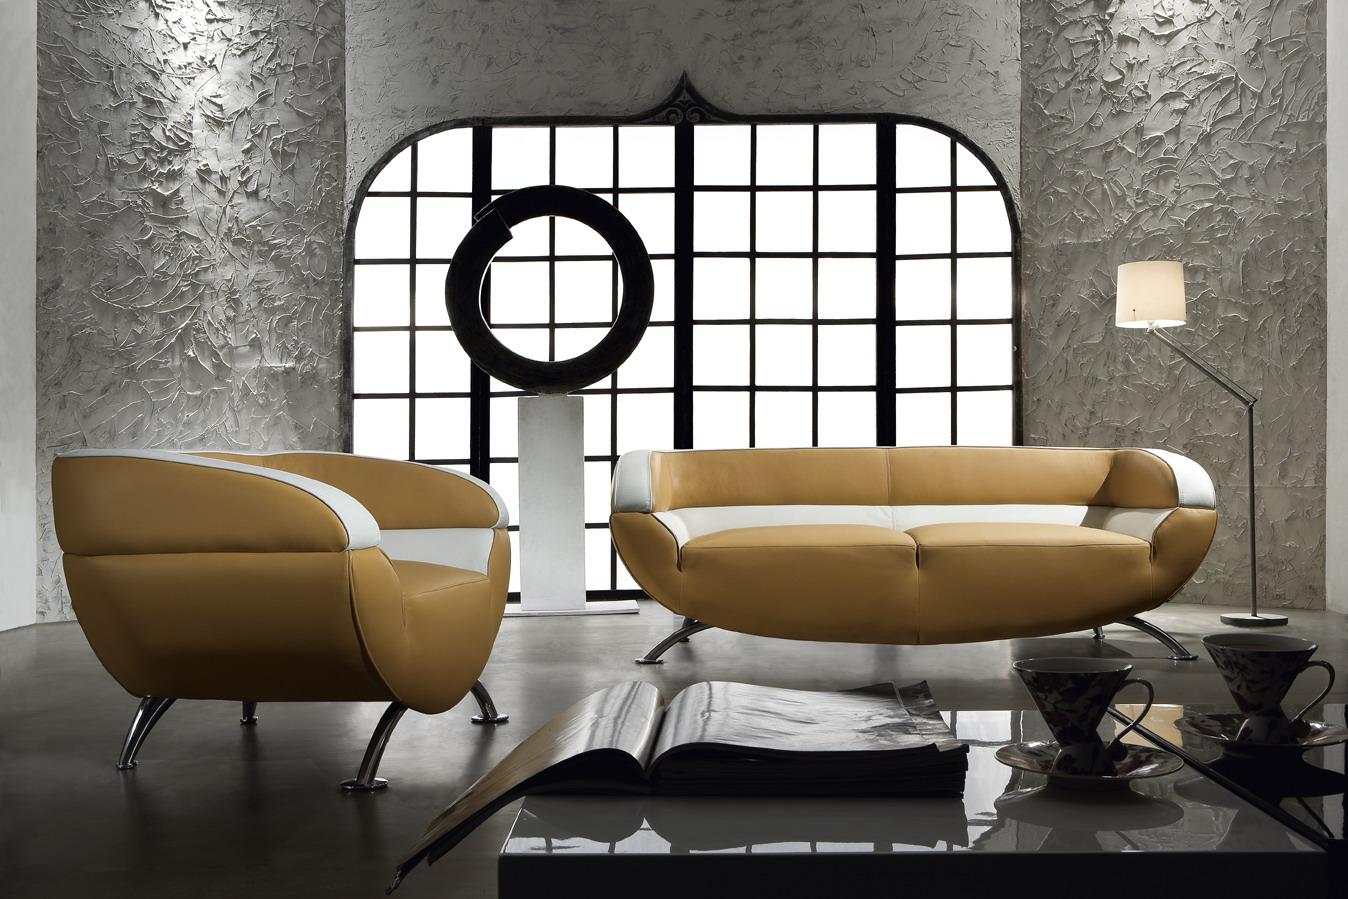 Black Design Co: Miss 60 Retro Modern 3 Piece Sofa Set